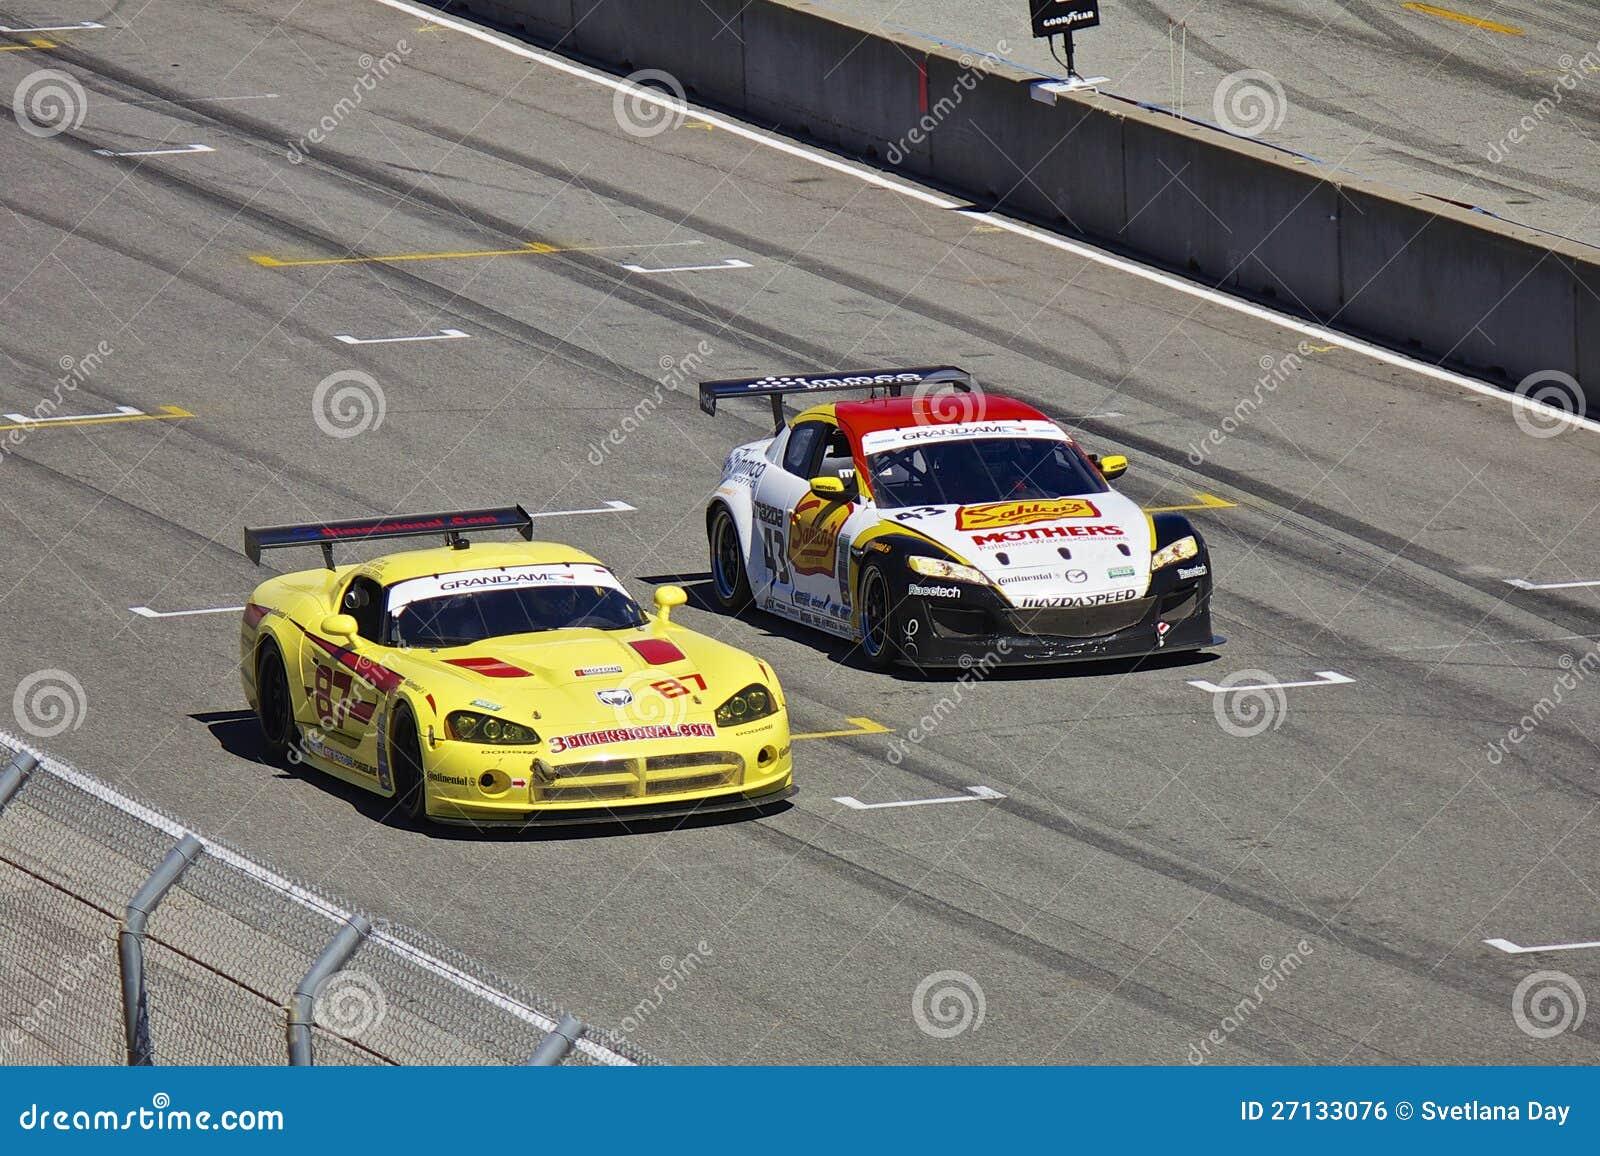 4.7 Dodge Motor >> Mazda RX-8 GT & Dodge Viper Grand AM @ Rolex Races Editorial Photo - Image: 27133076